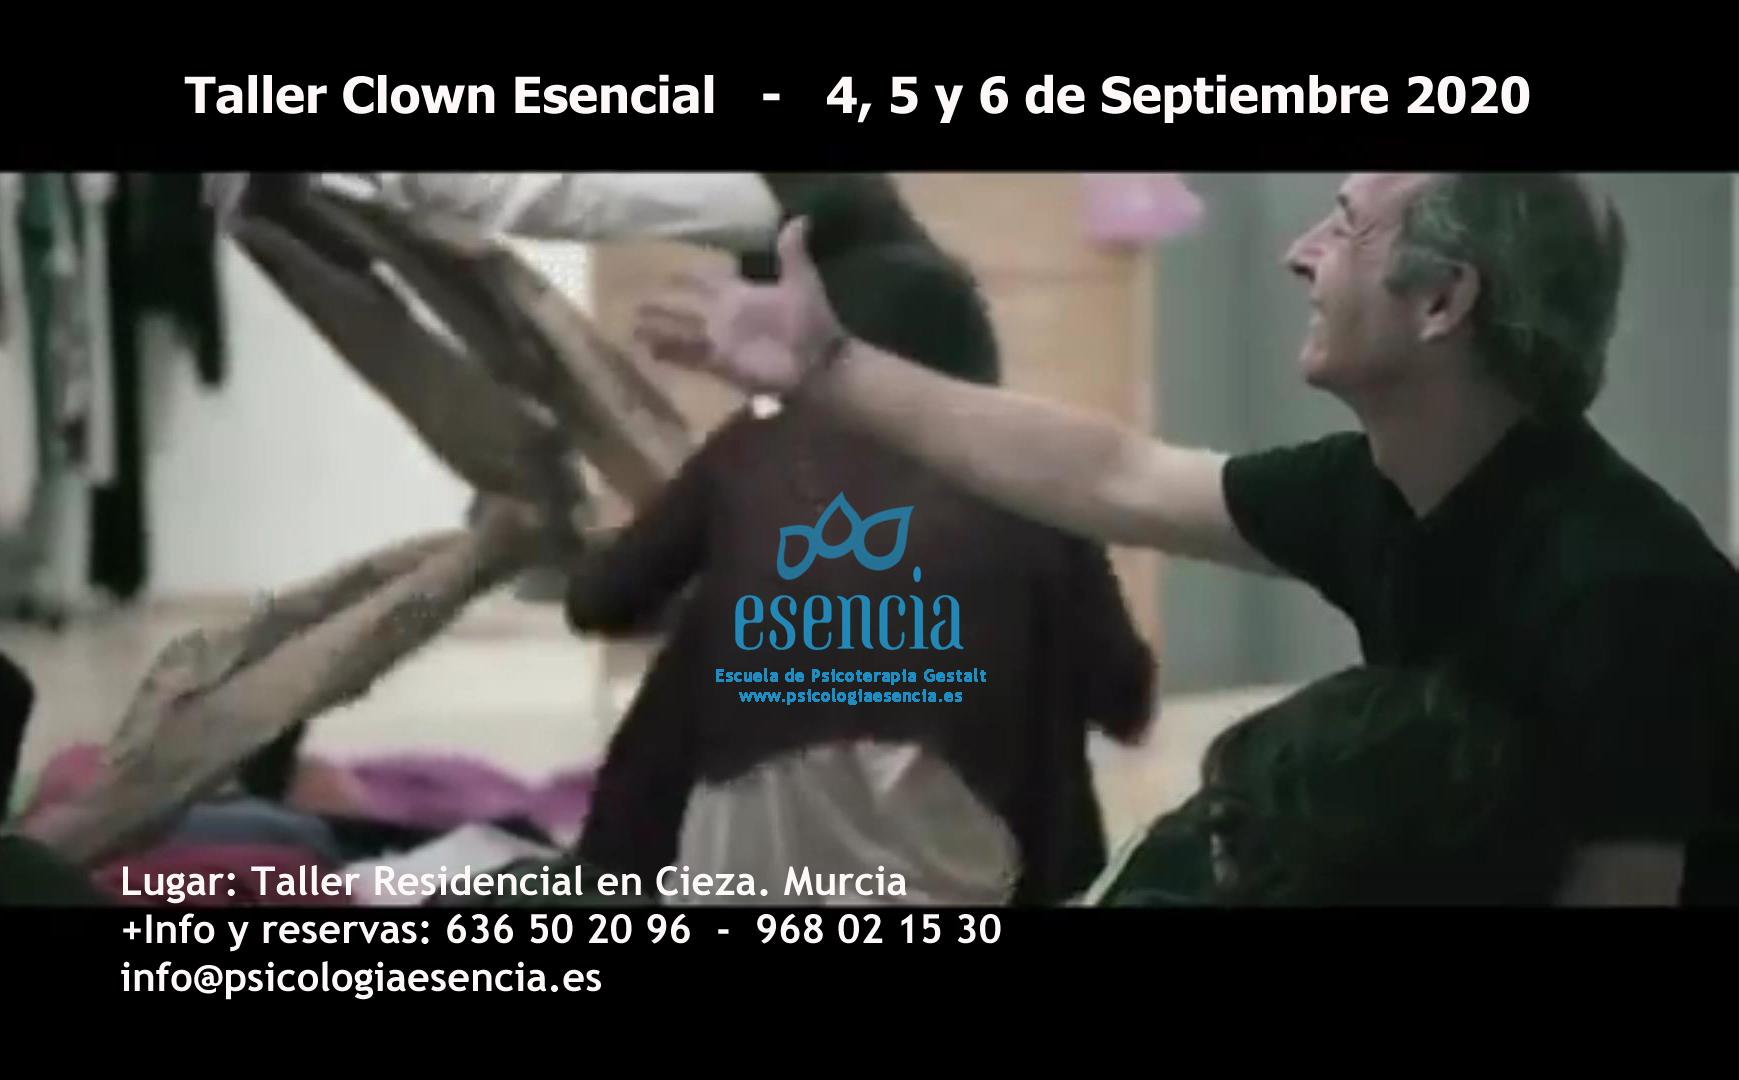 Taller Clown Esencial - Alain Vigneau - 11, 12 y 13 de septiembre